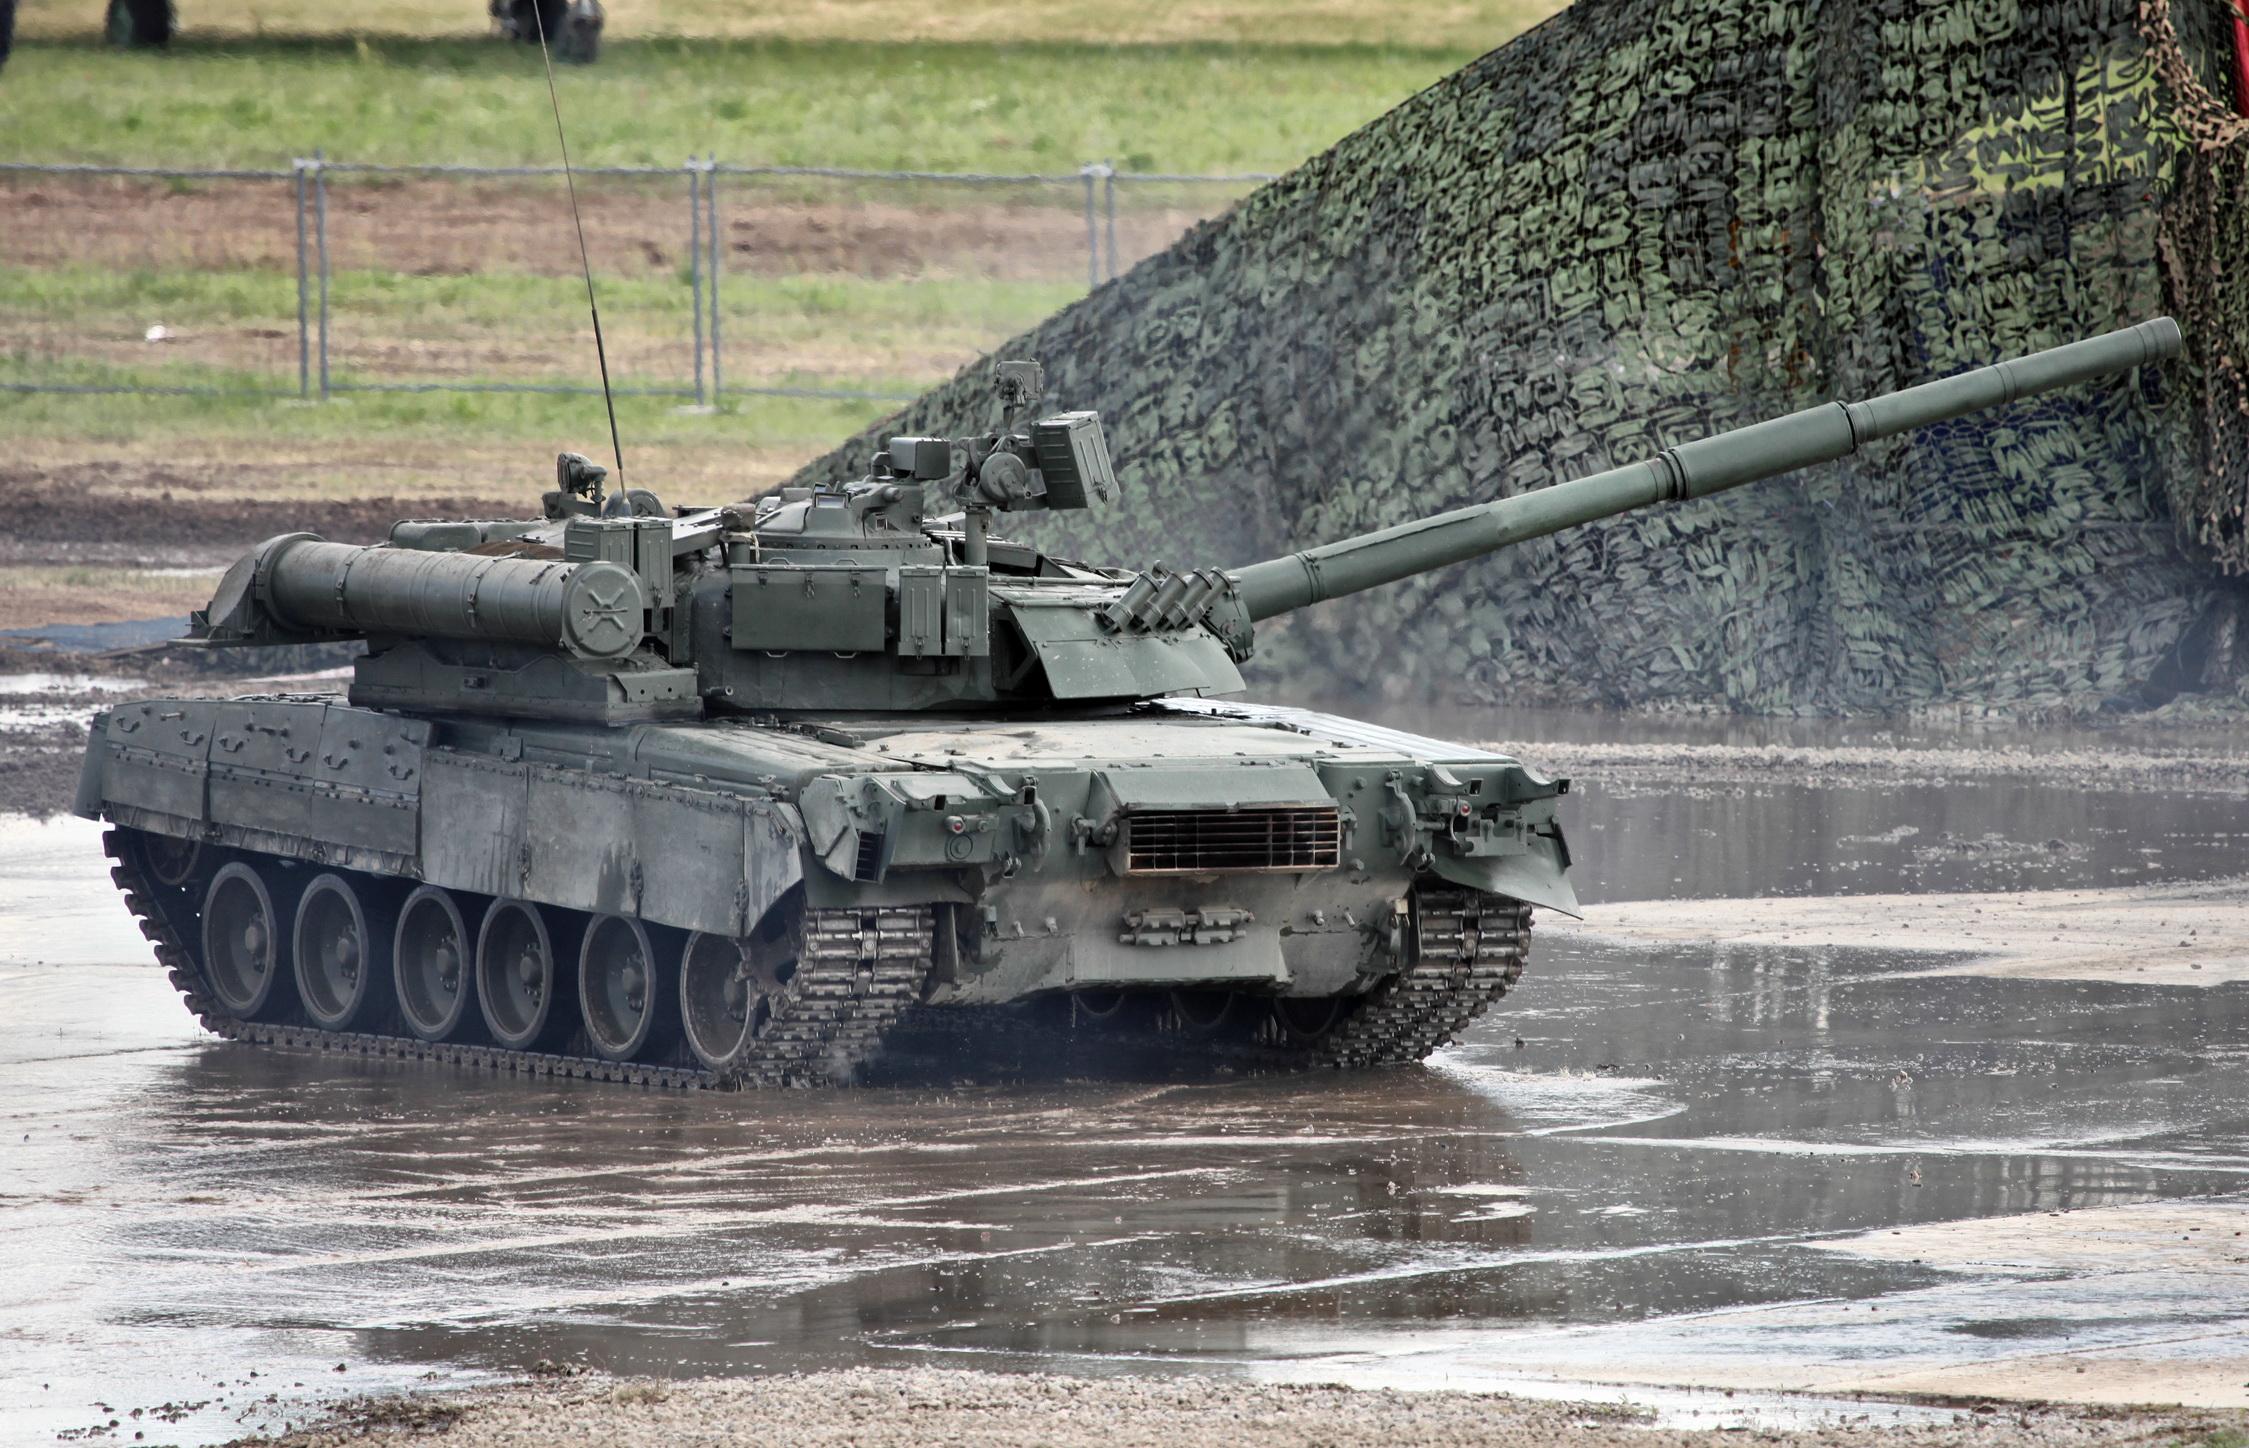 T-80U_MBT_photo006.jpg